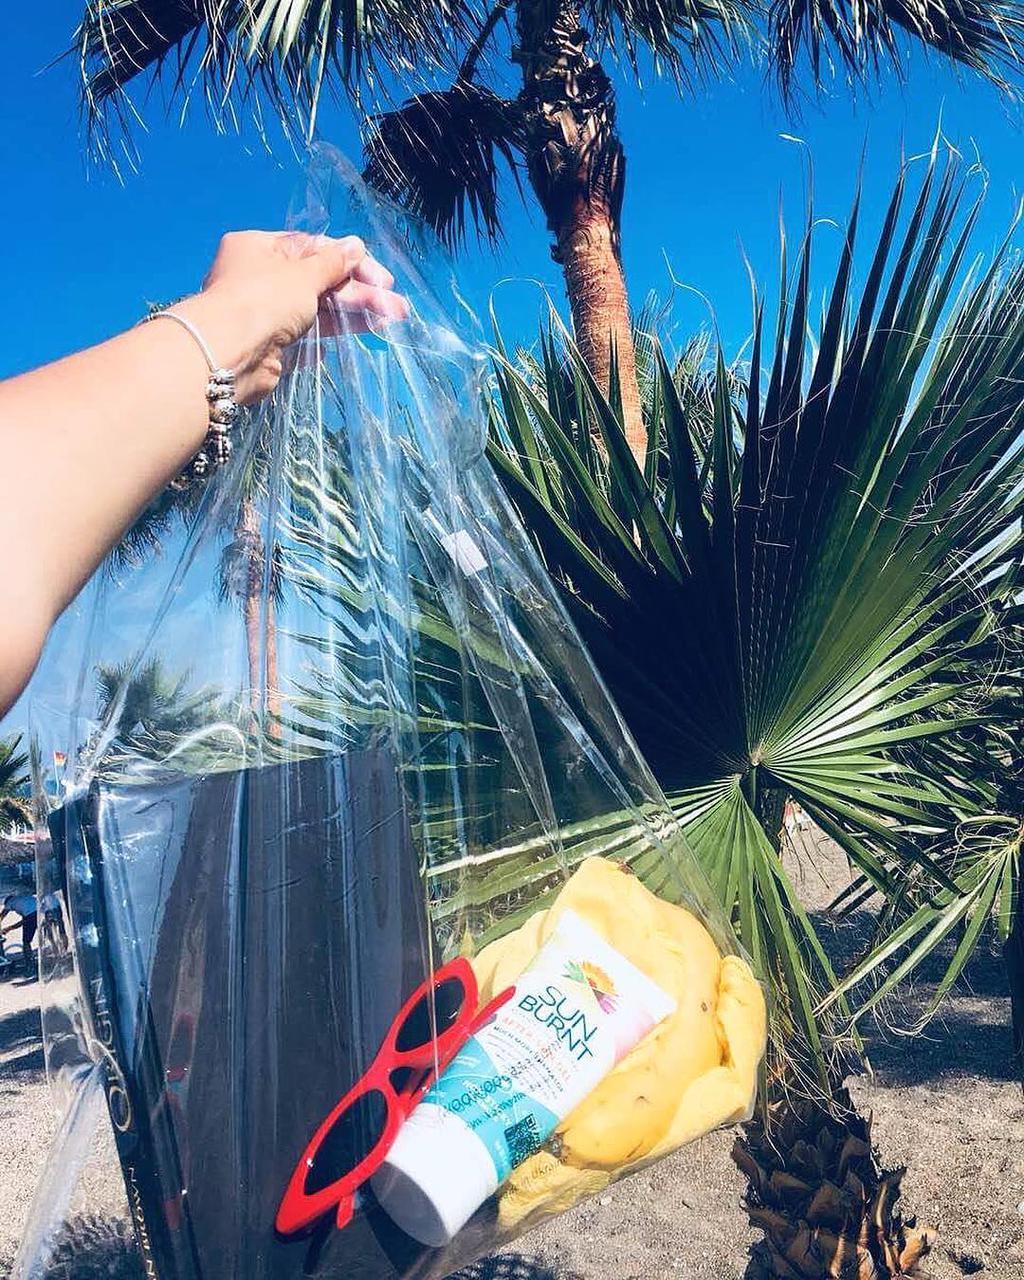 Стильная прозрачная пляжная сумка. Тренд лета 2019!